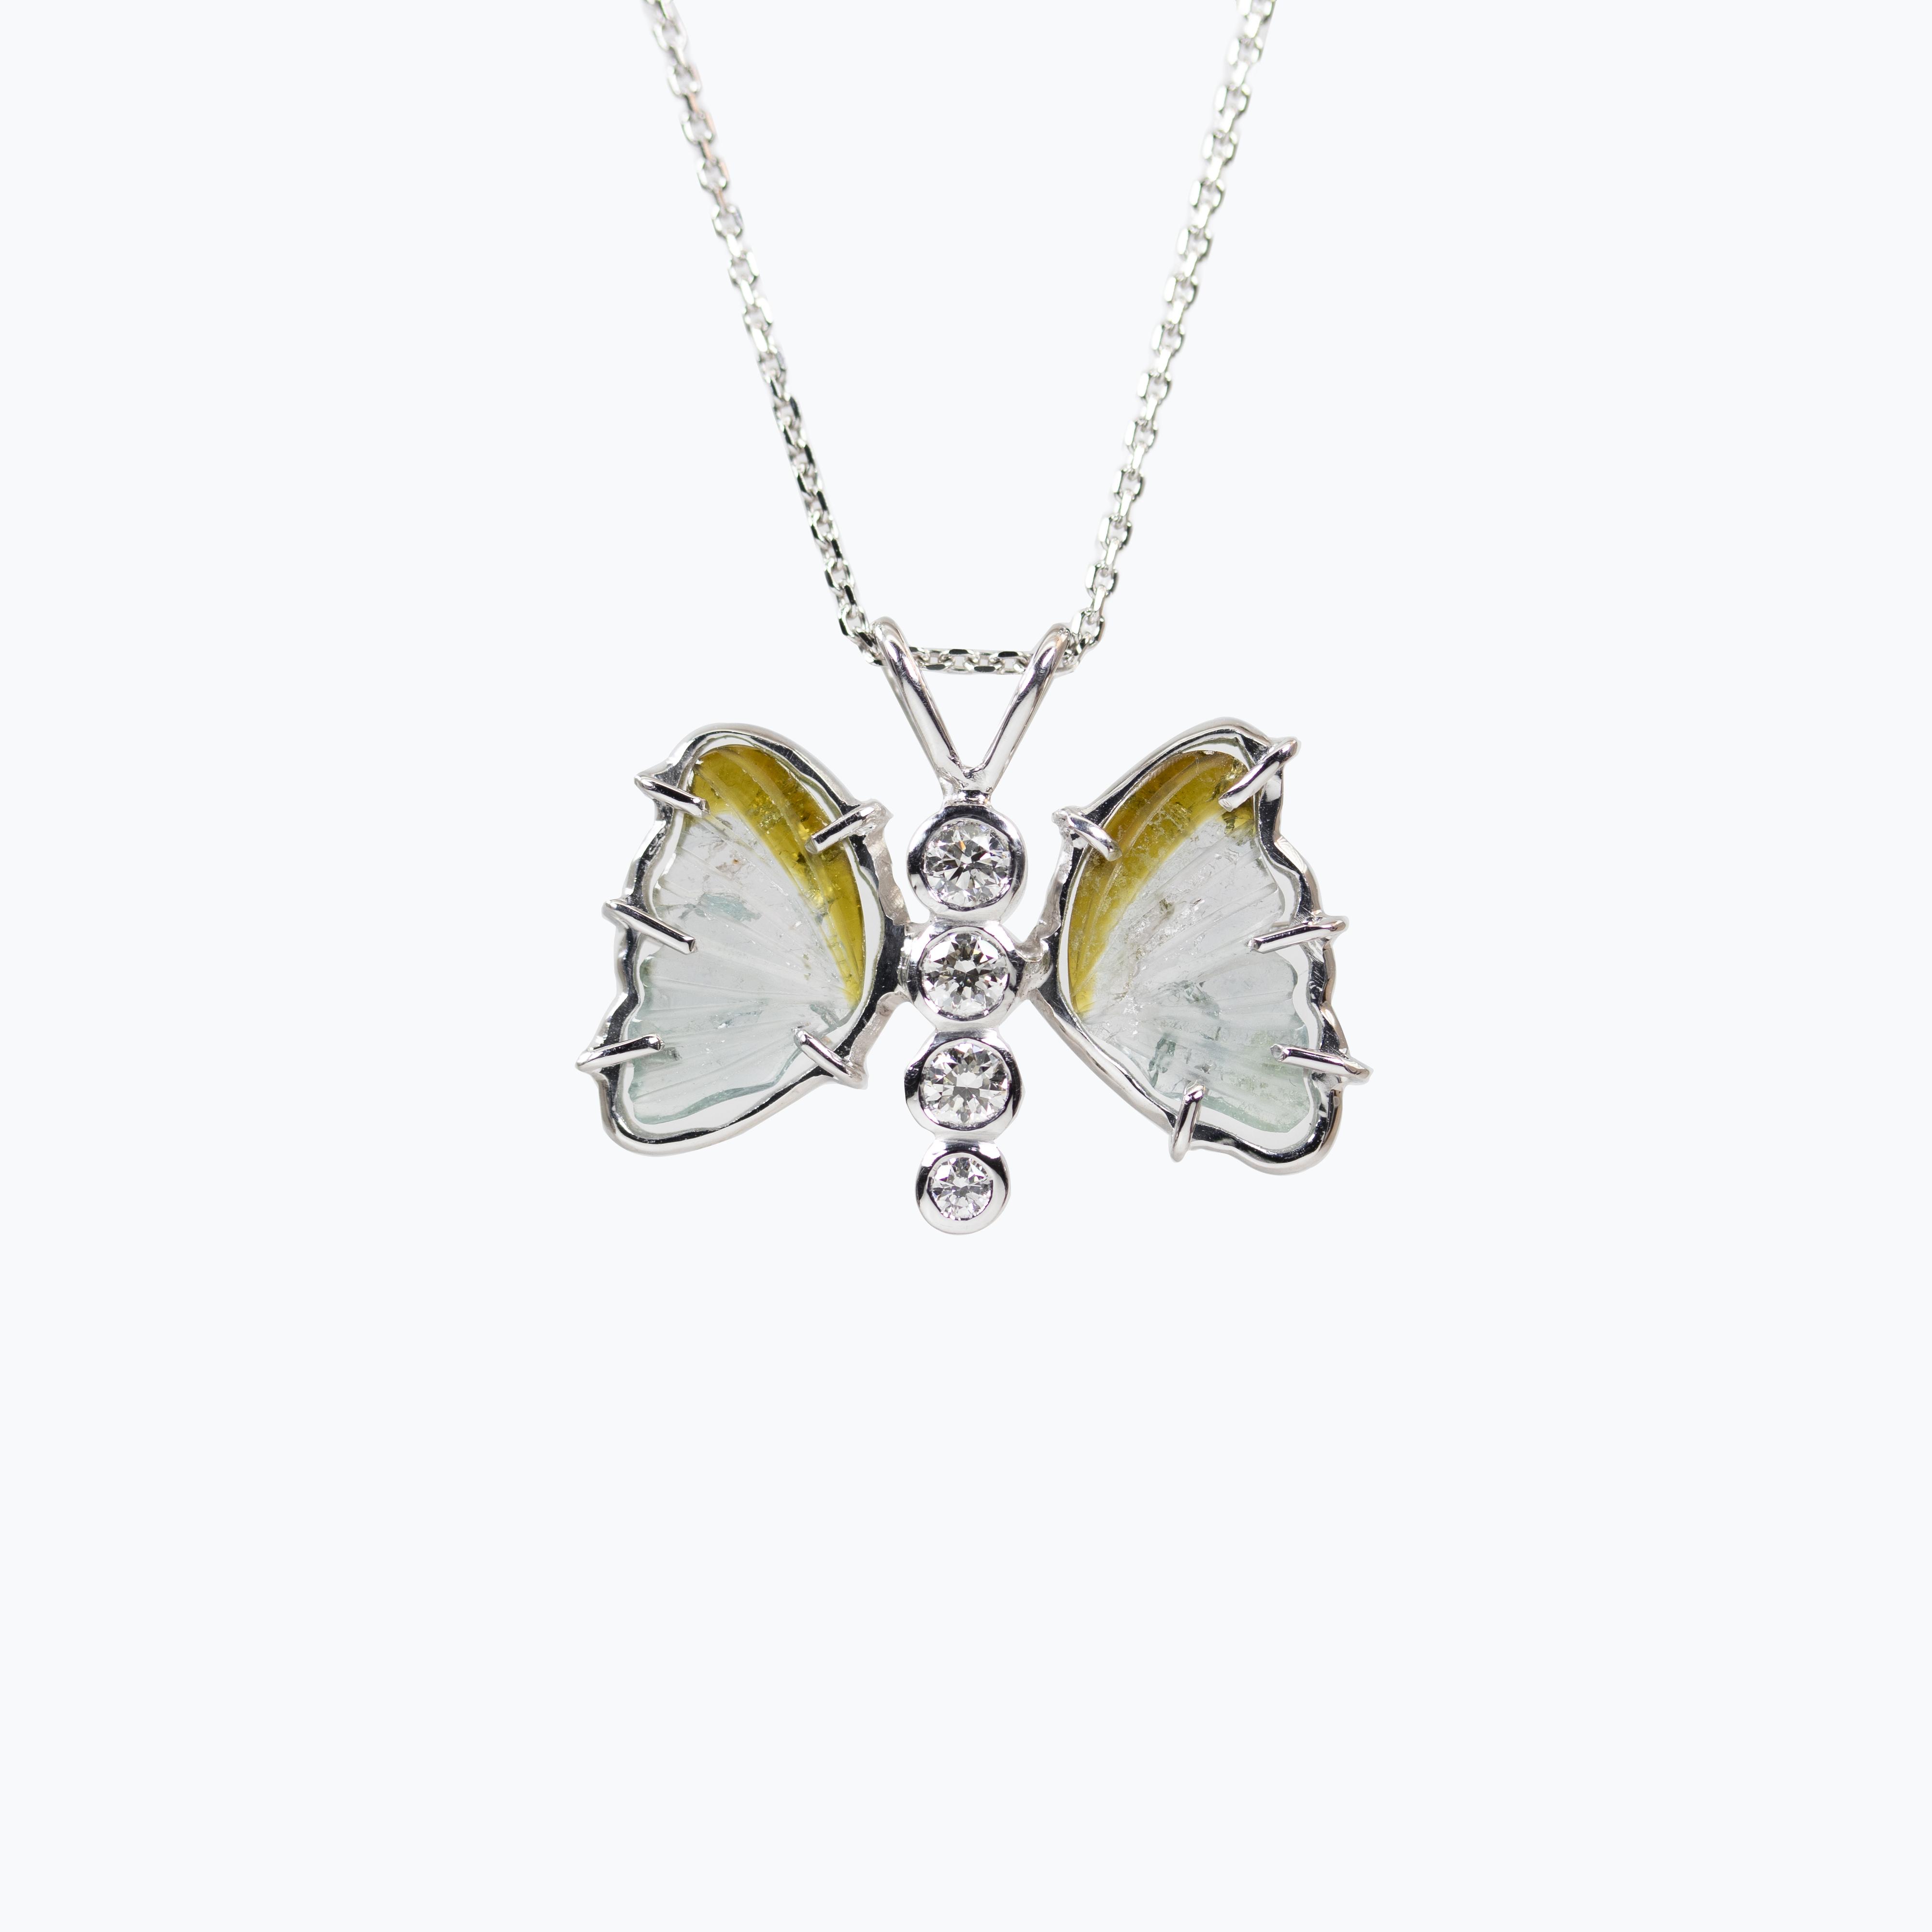 Diamond and Tourmaline Butterfly Pendant Necklace